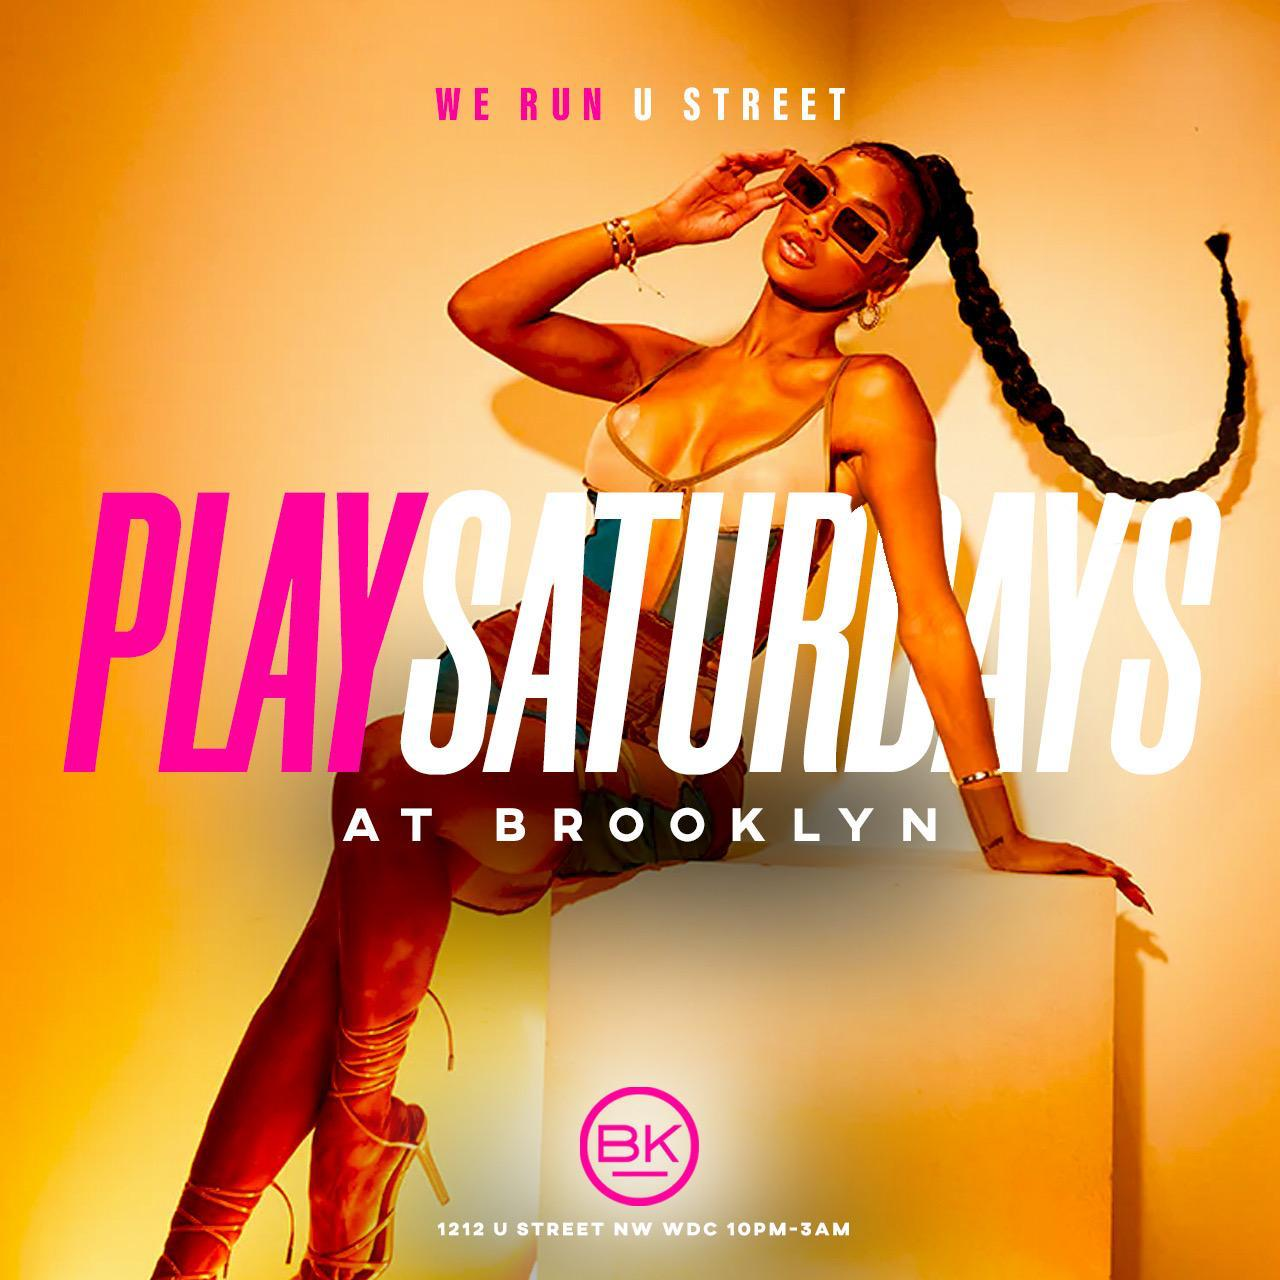 #PlaySaturdays At Brooklyn